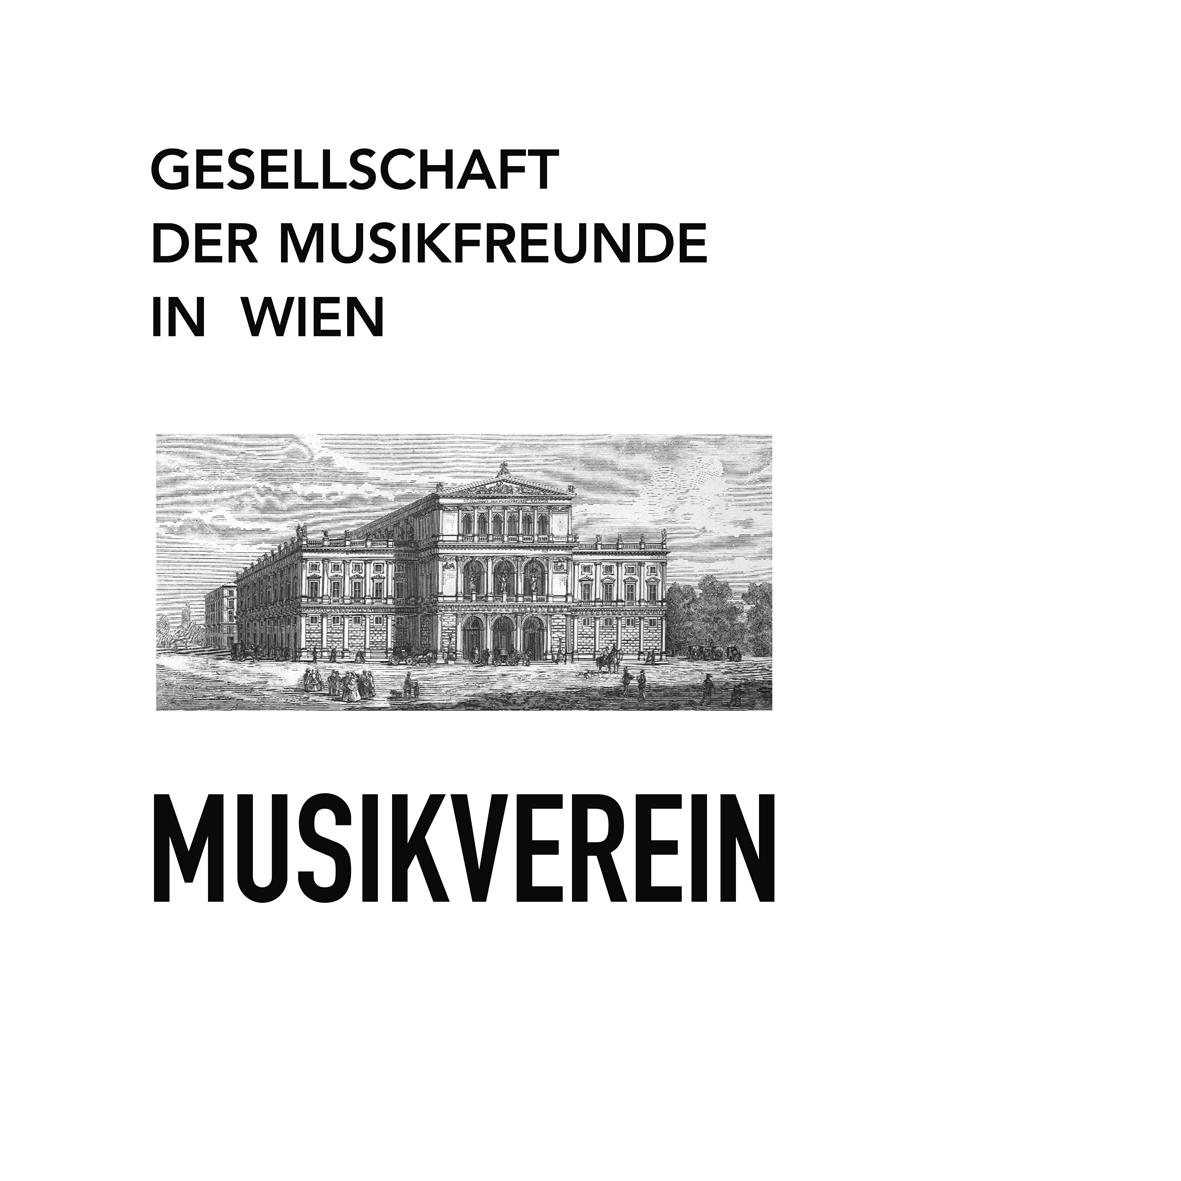 Gesellschaft der Musikfreunde in Wien